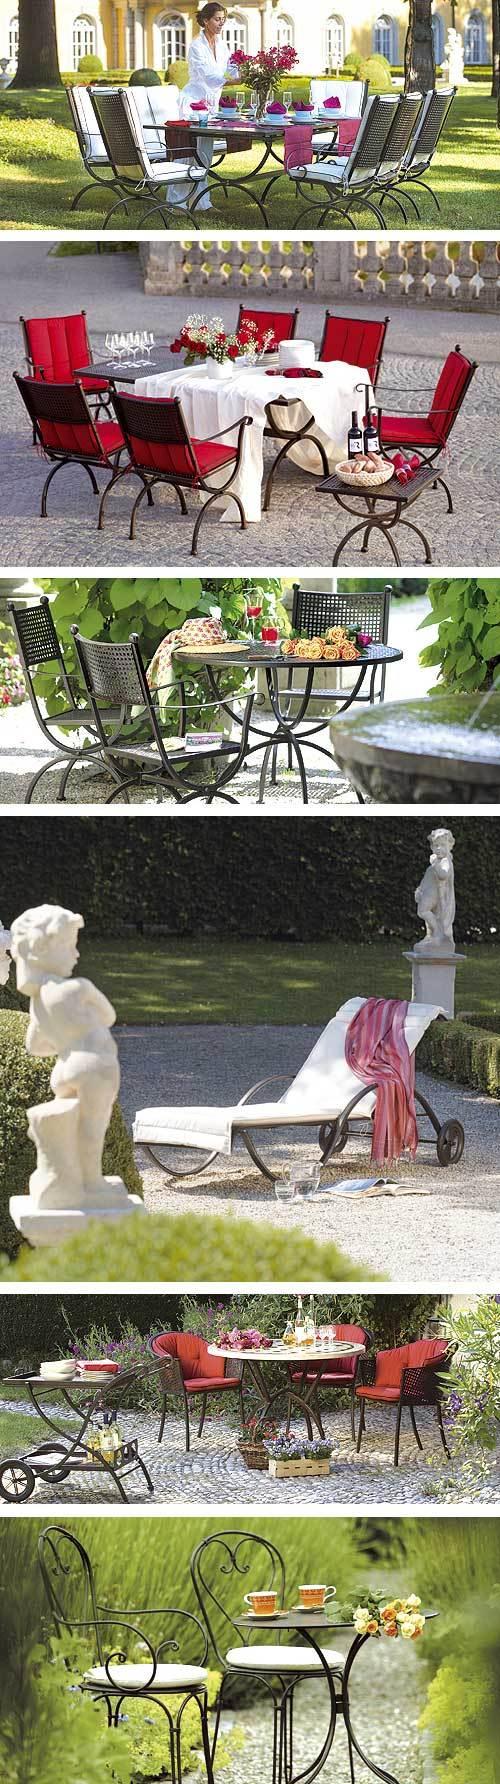 impressionen und produktinfo mbm gartenm bel romeo art jardin. Black Bedroom Furniture Sets. Home Design Ideas